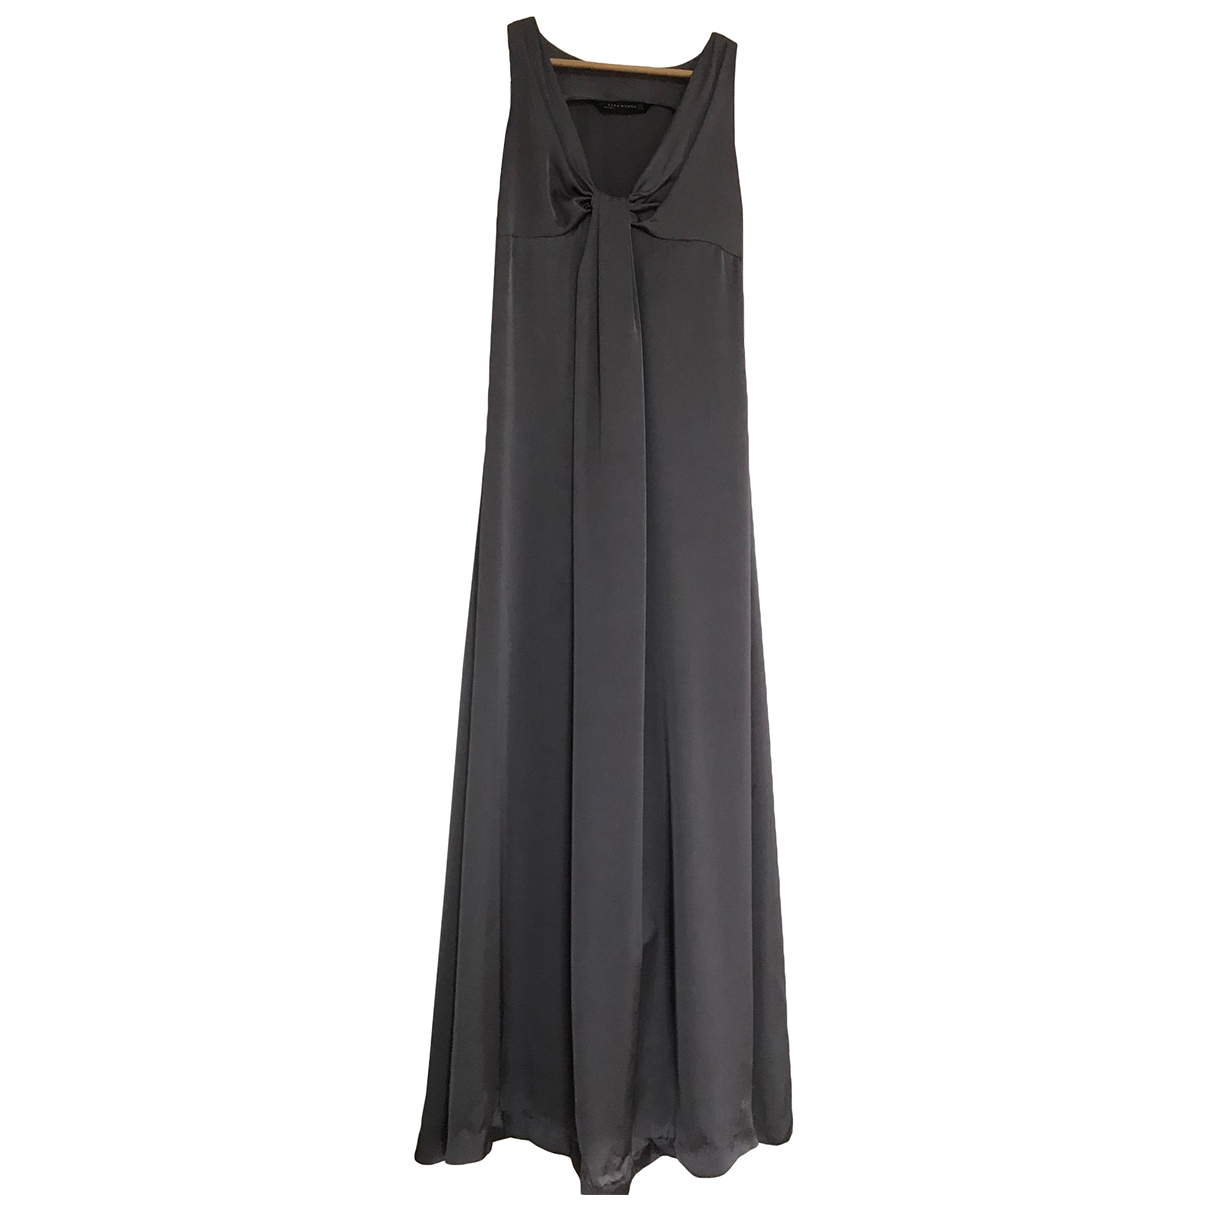 Zara \N Kleid in  Lila Polyester